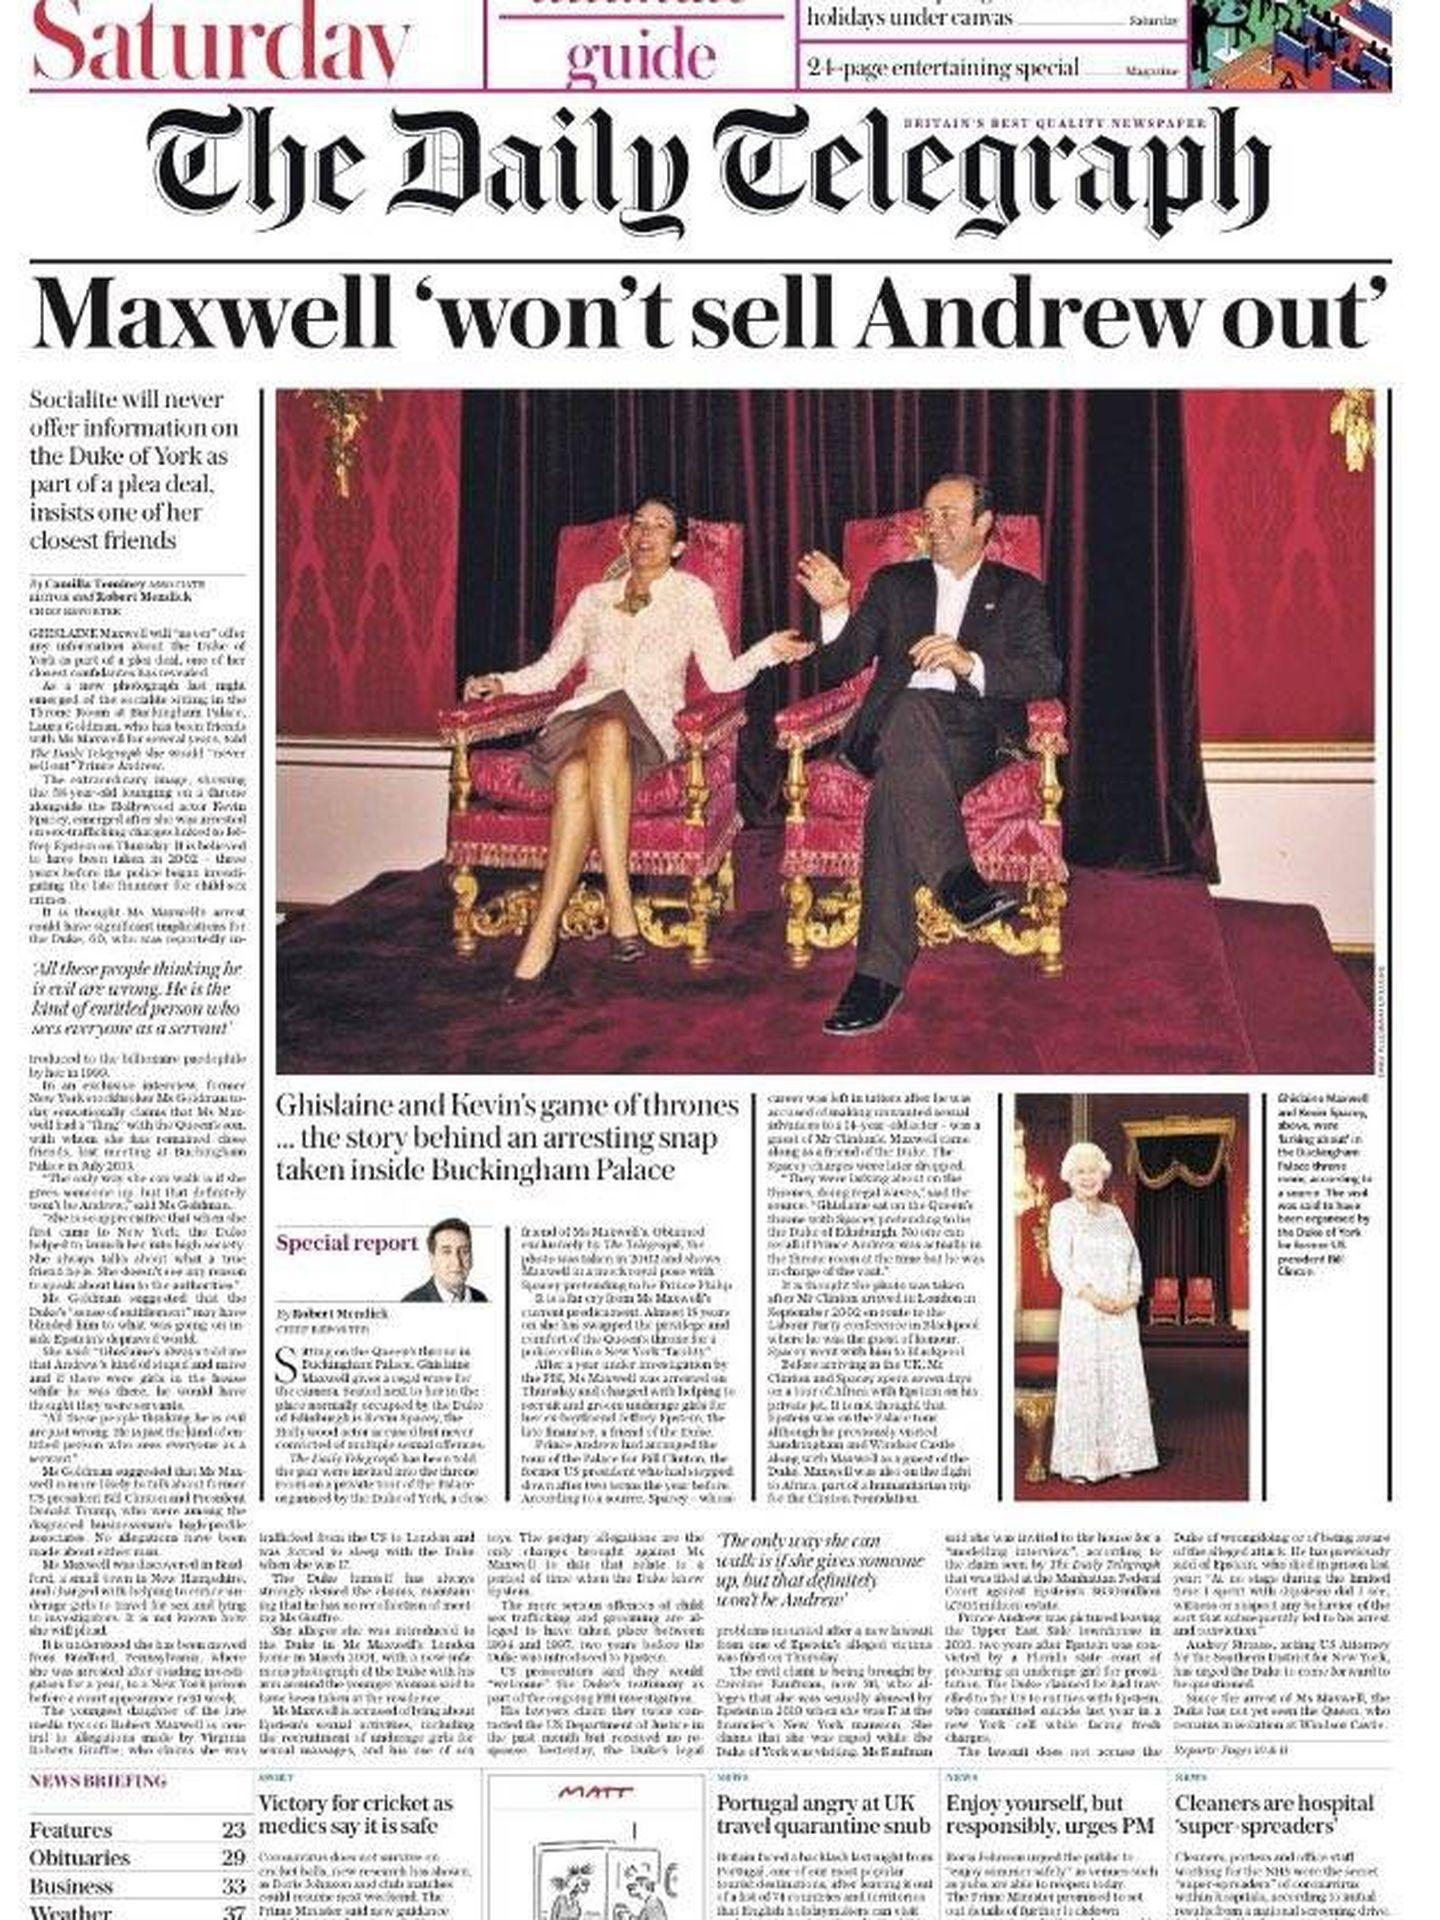 La portada del 'Daily Telegraph', con Kevin Spacey y Ghislaine Maxwell en Buckingham.